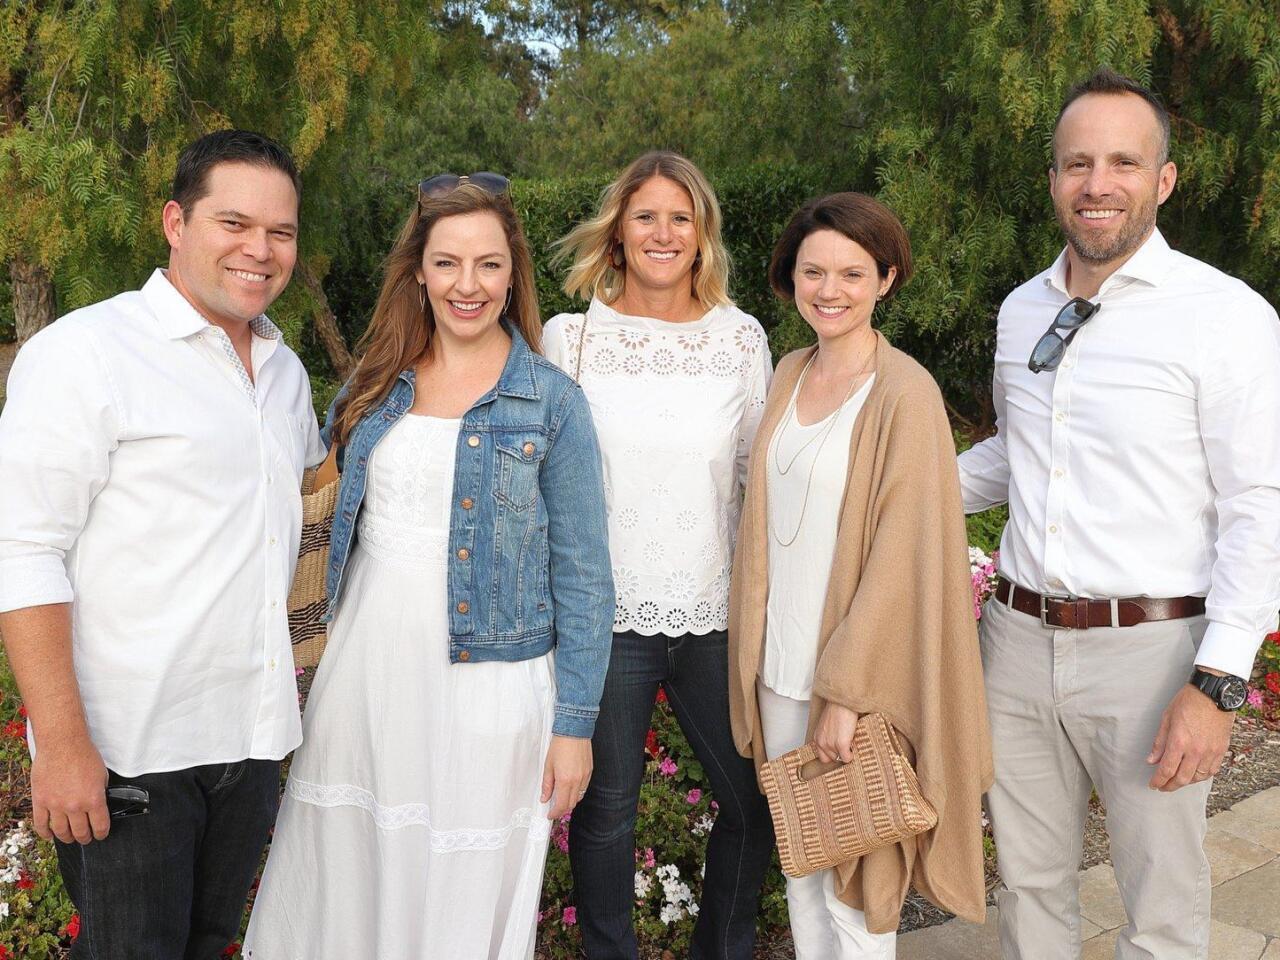 Marc and Kyri Van Hoose, Stacy Hoffman, Stacy and Joe Charat